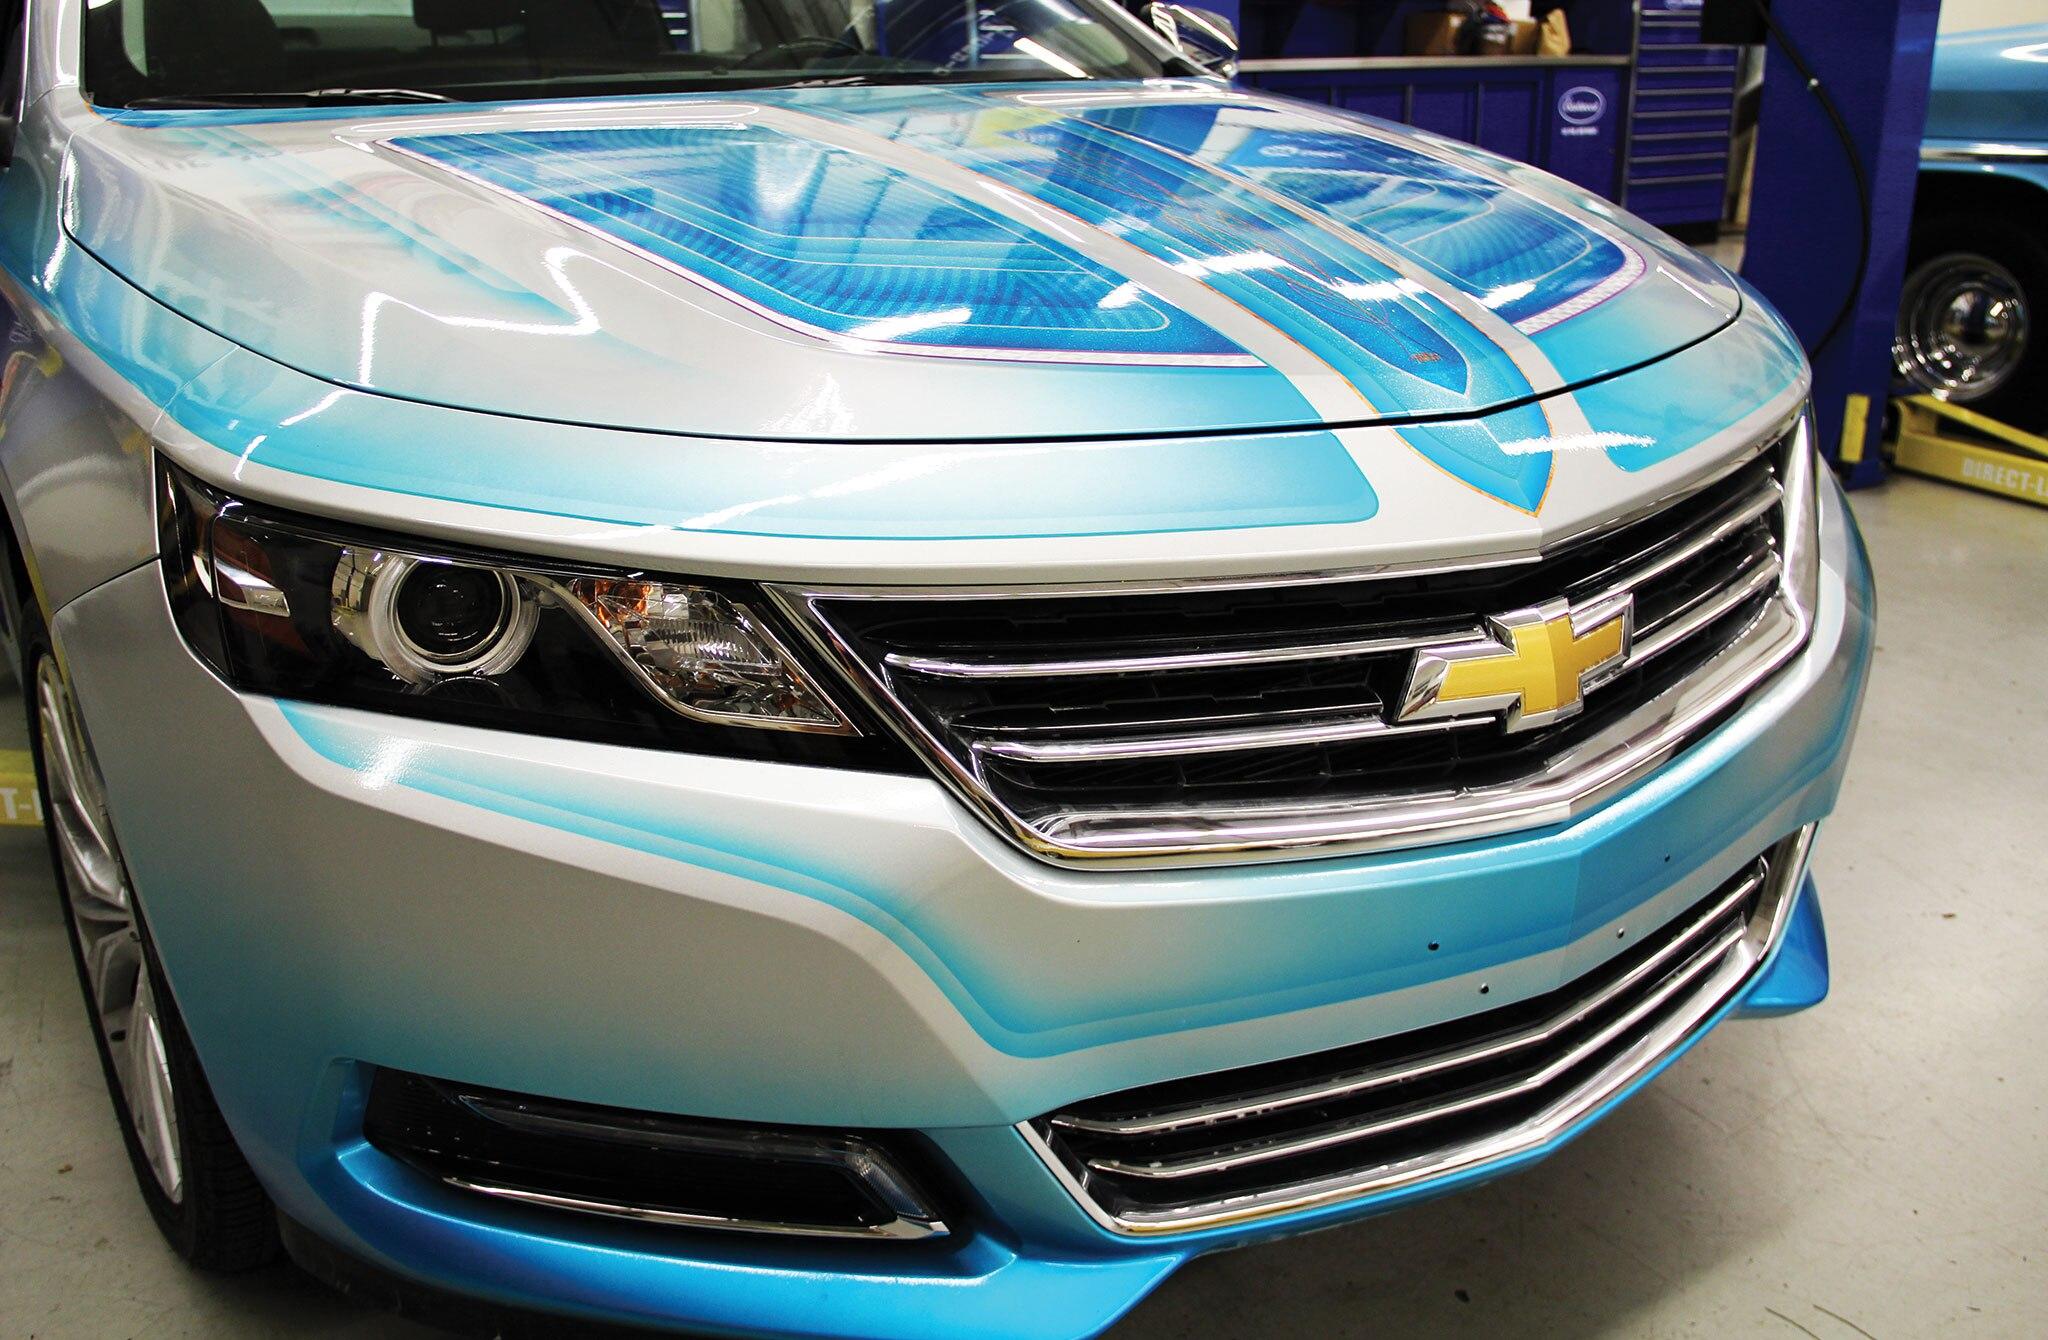 2016 Chevrolet Impala Midnight Edition as well 2015 Chevy Impala LTZ ...